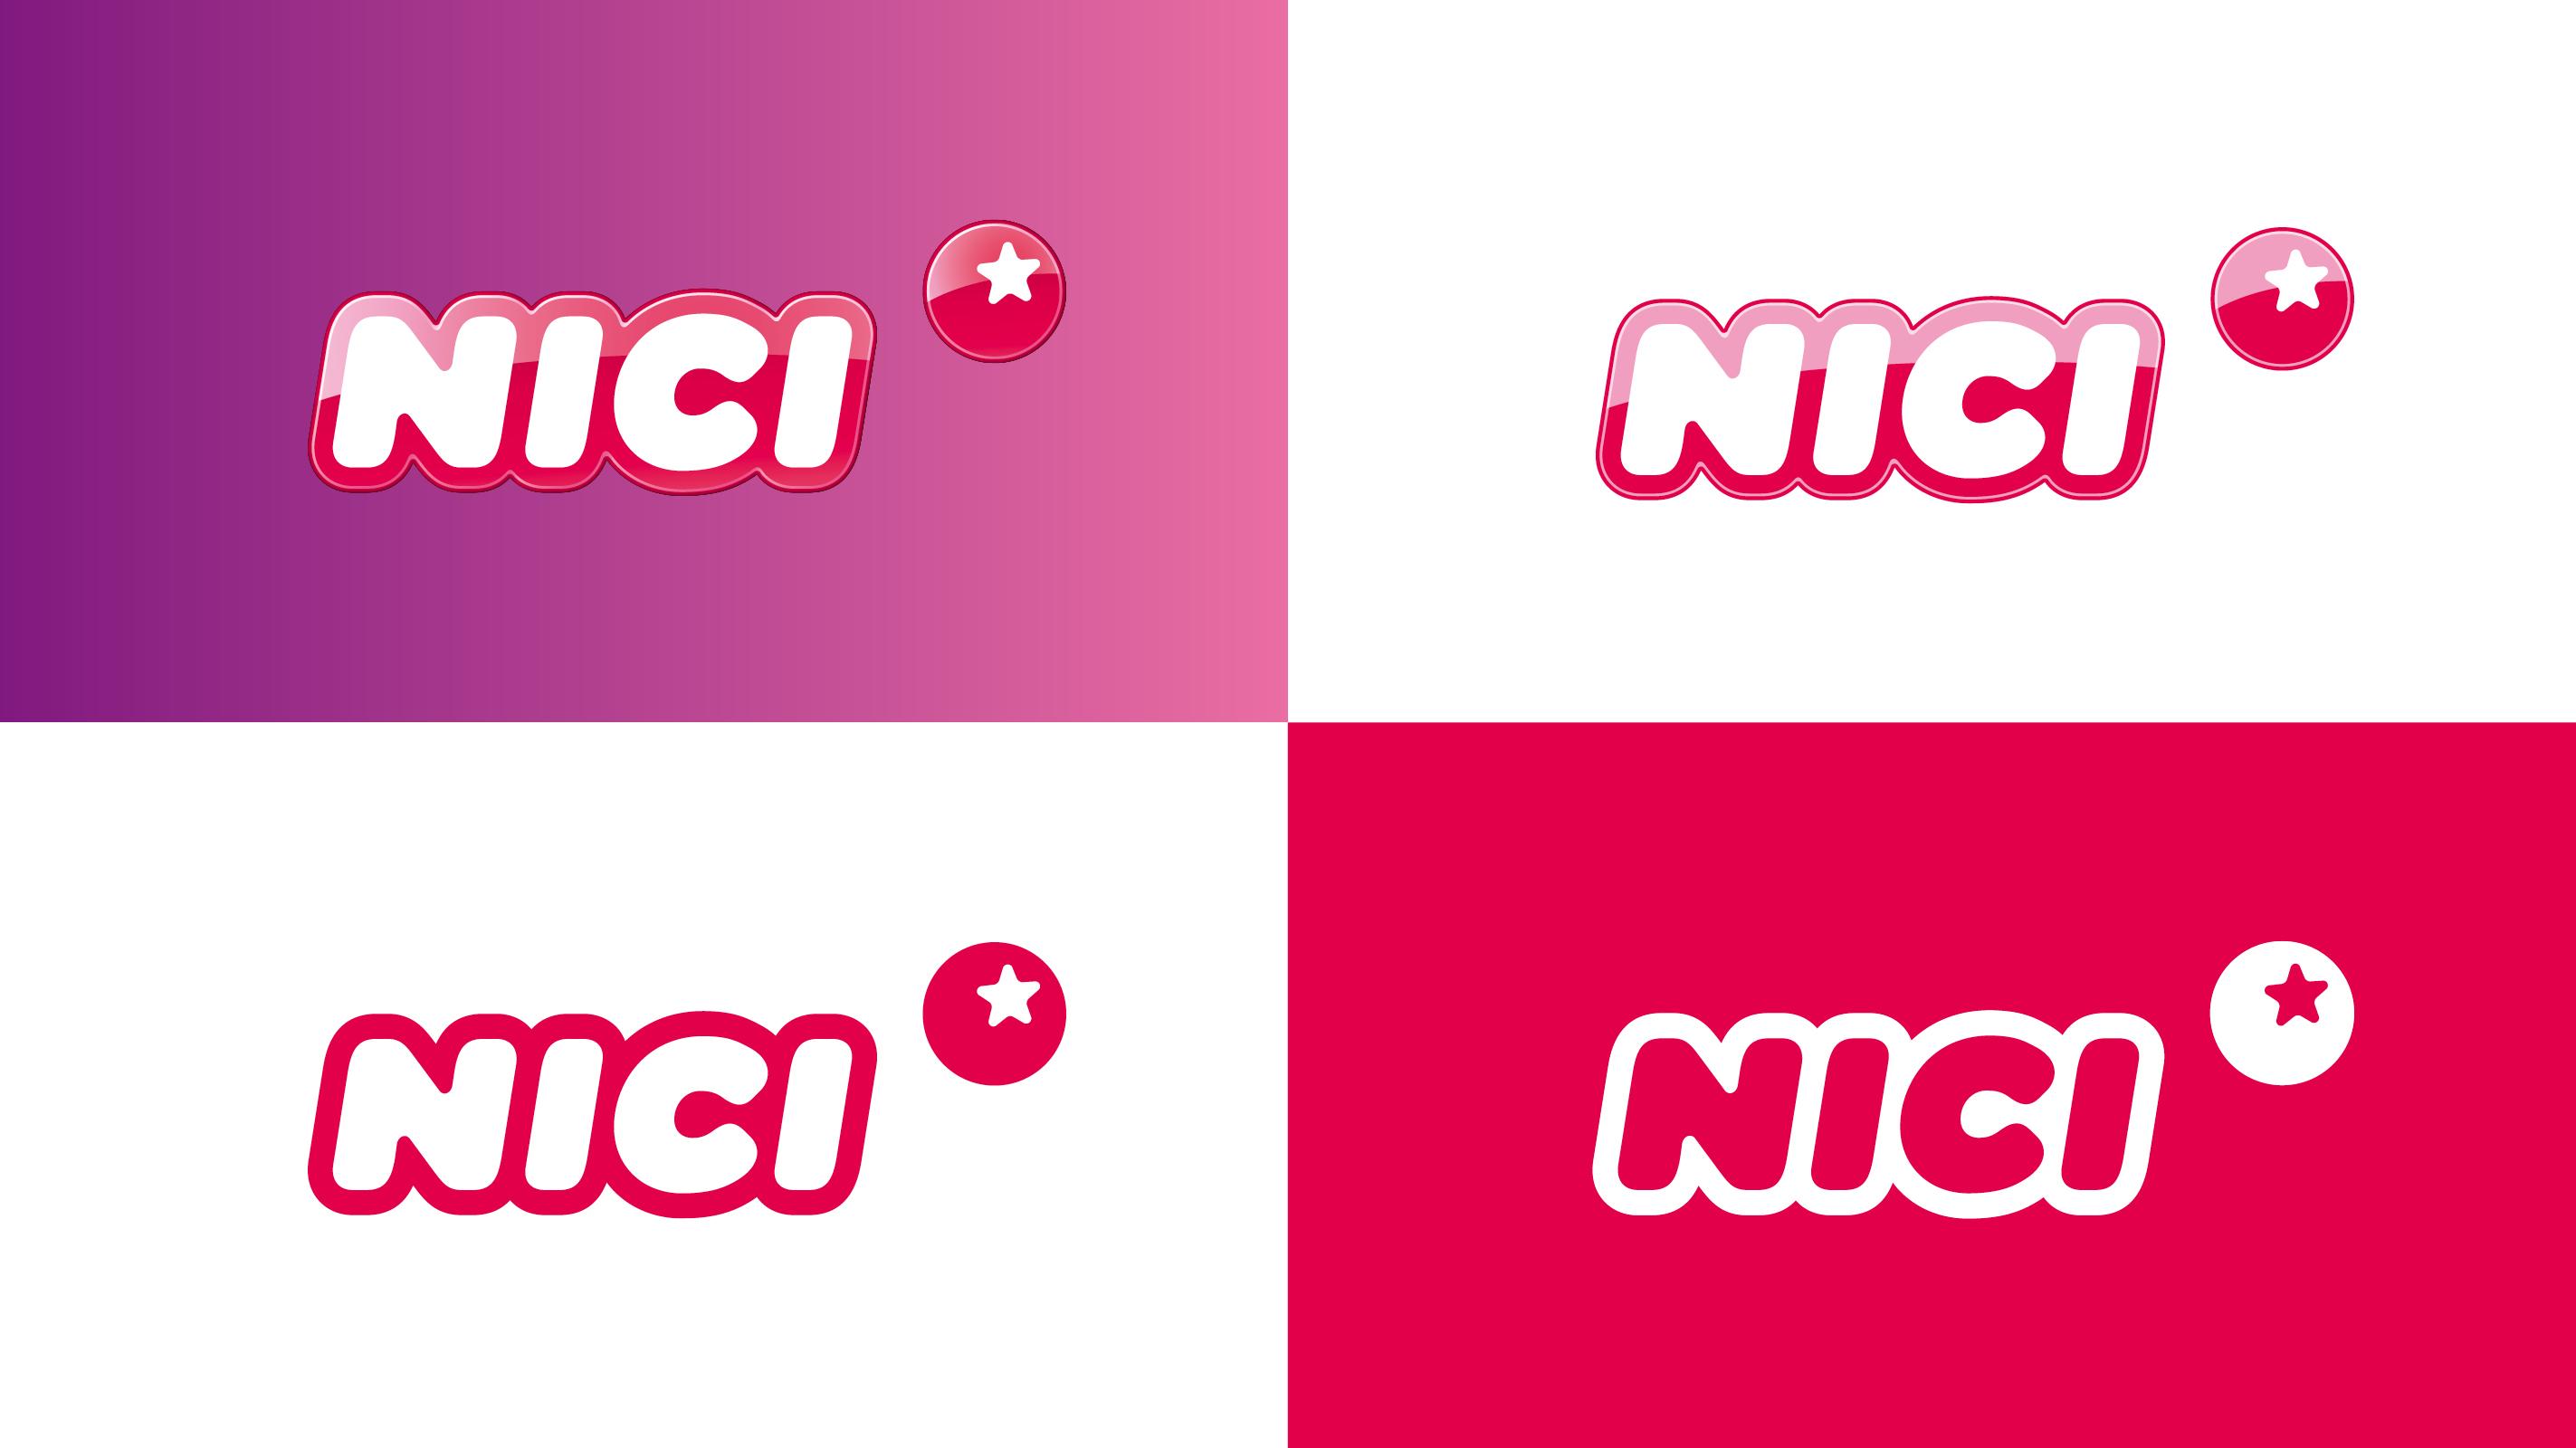 Nici Rebranding – Poarangan Brand Design3